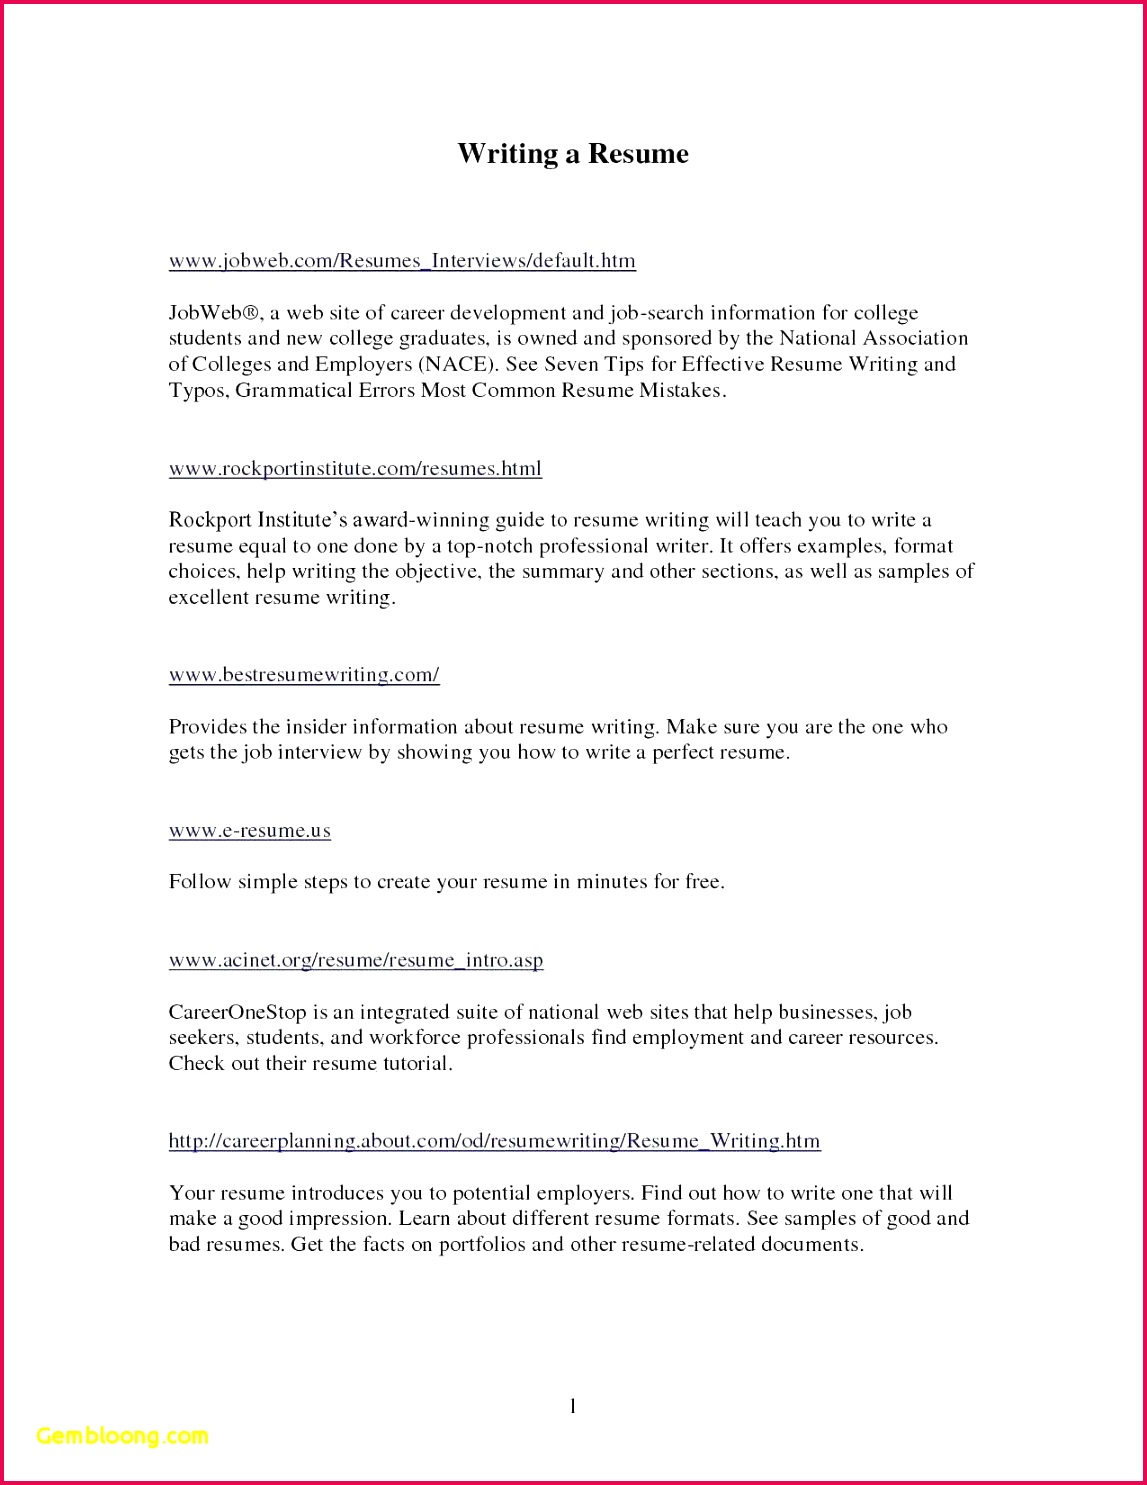 free award templates free certificate templates for mac 69 top fabulous free printable certificate templates of free printable certificate templates